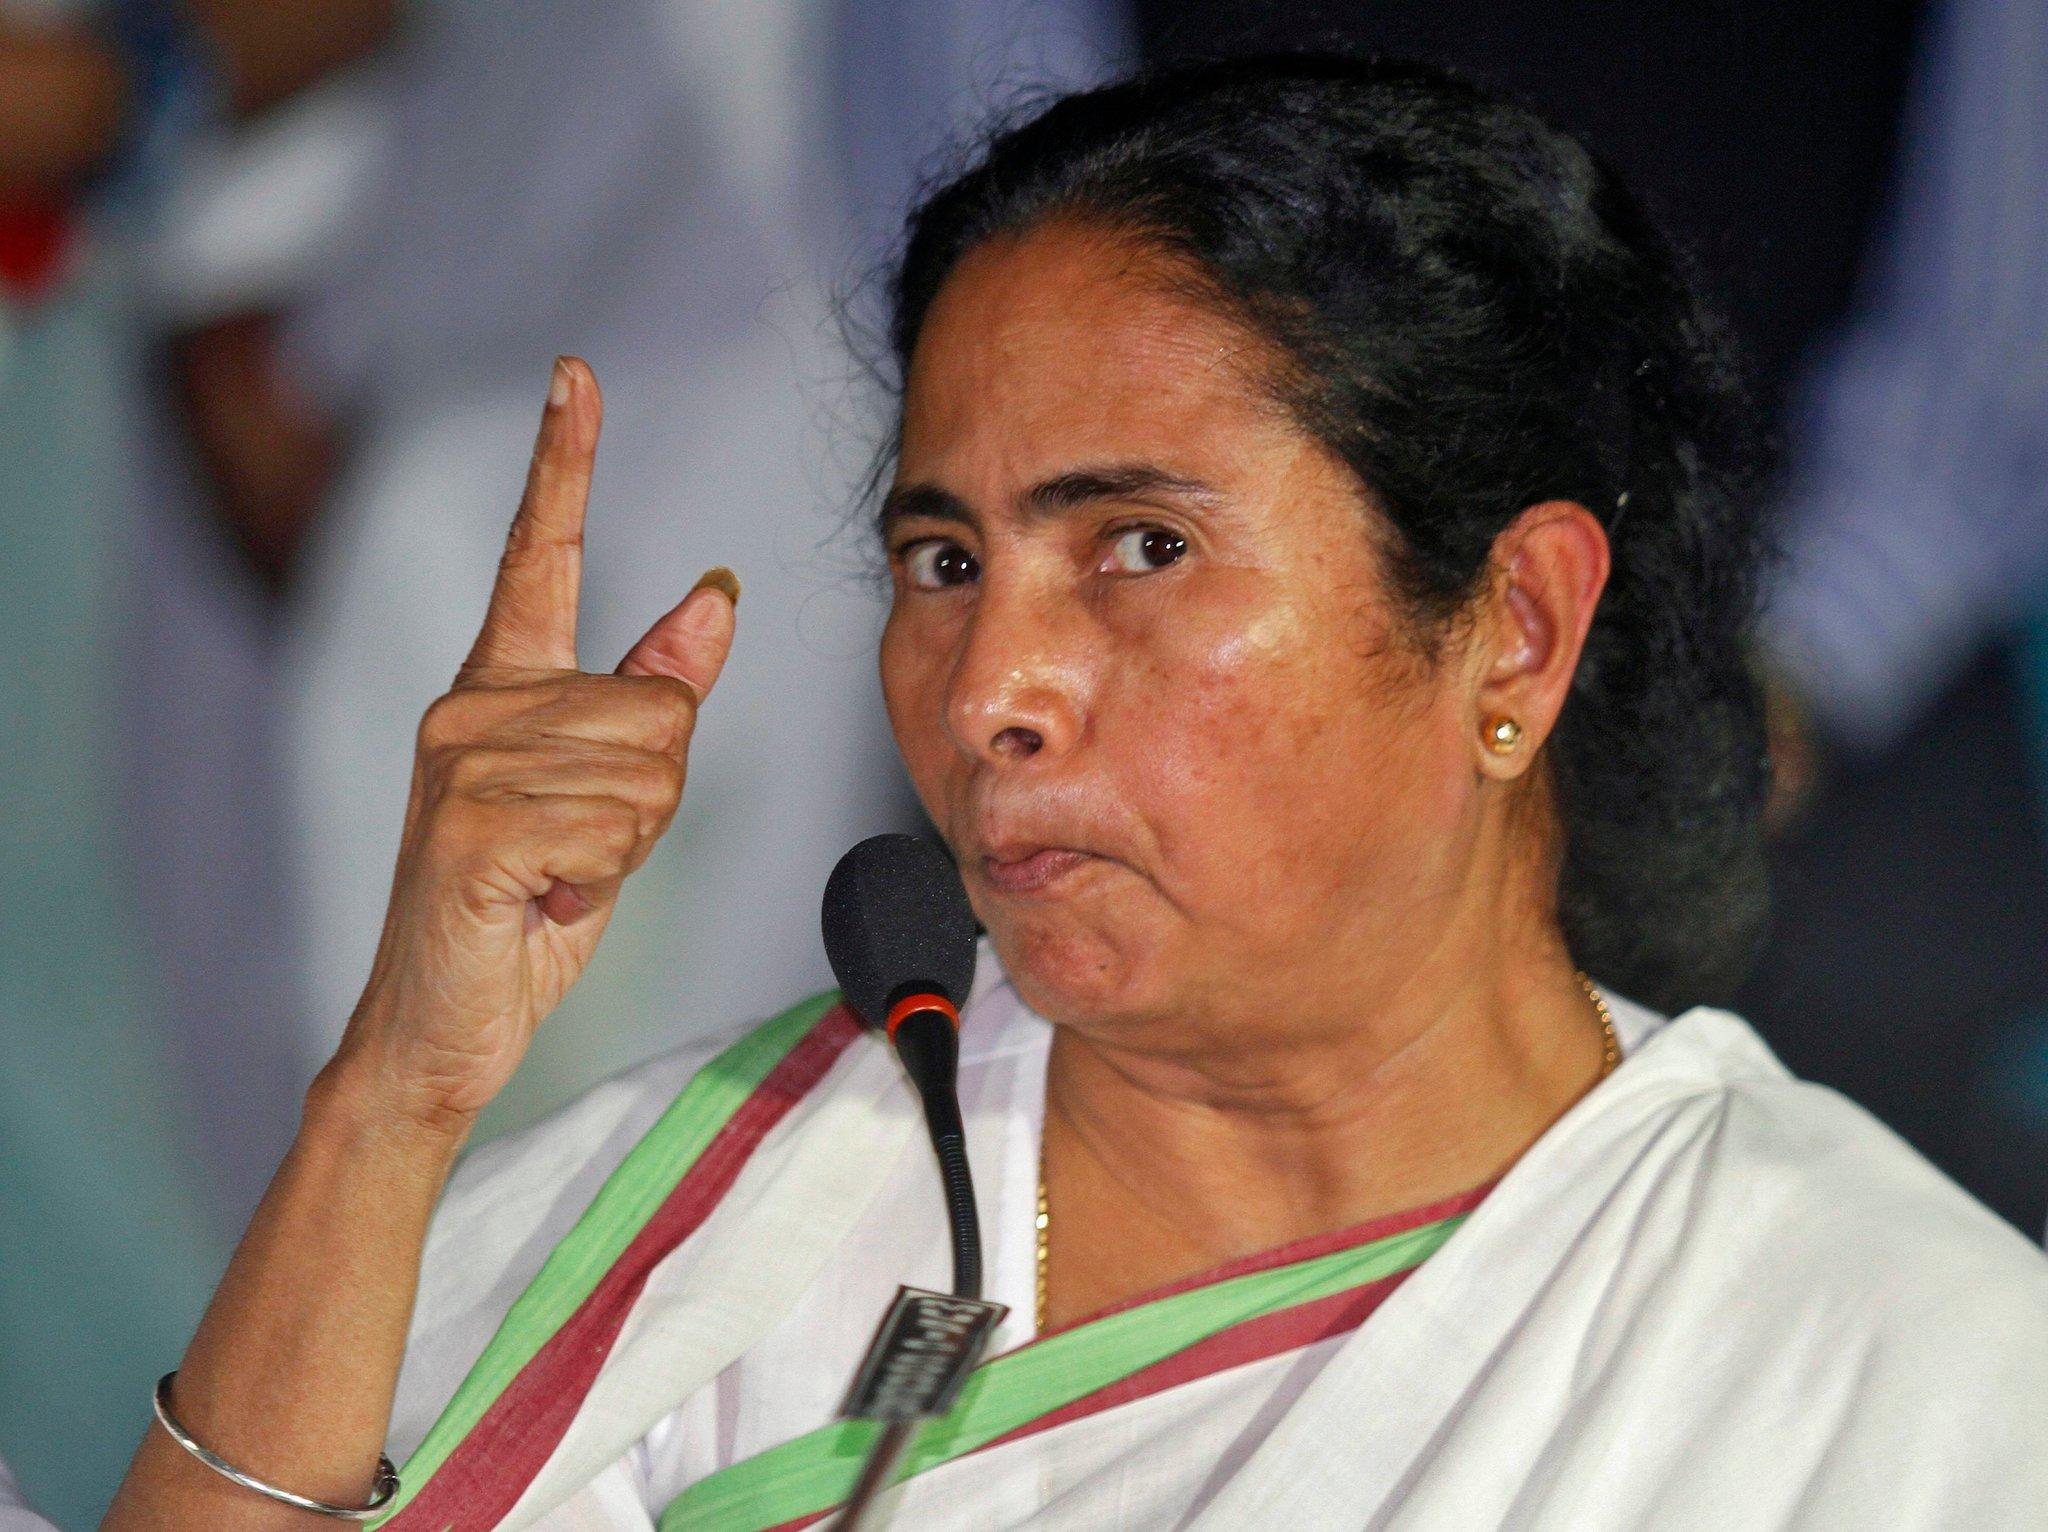 24-Mamata-Banerjee-IndiaInk-superJumbo